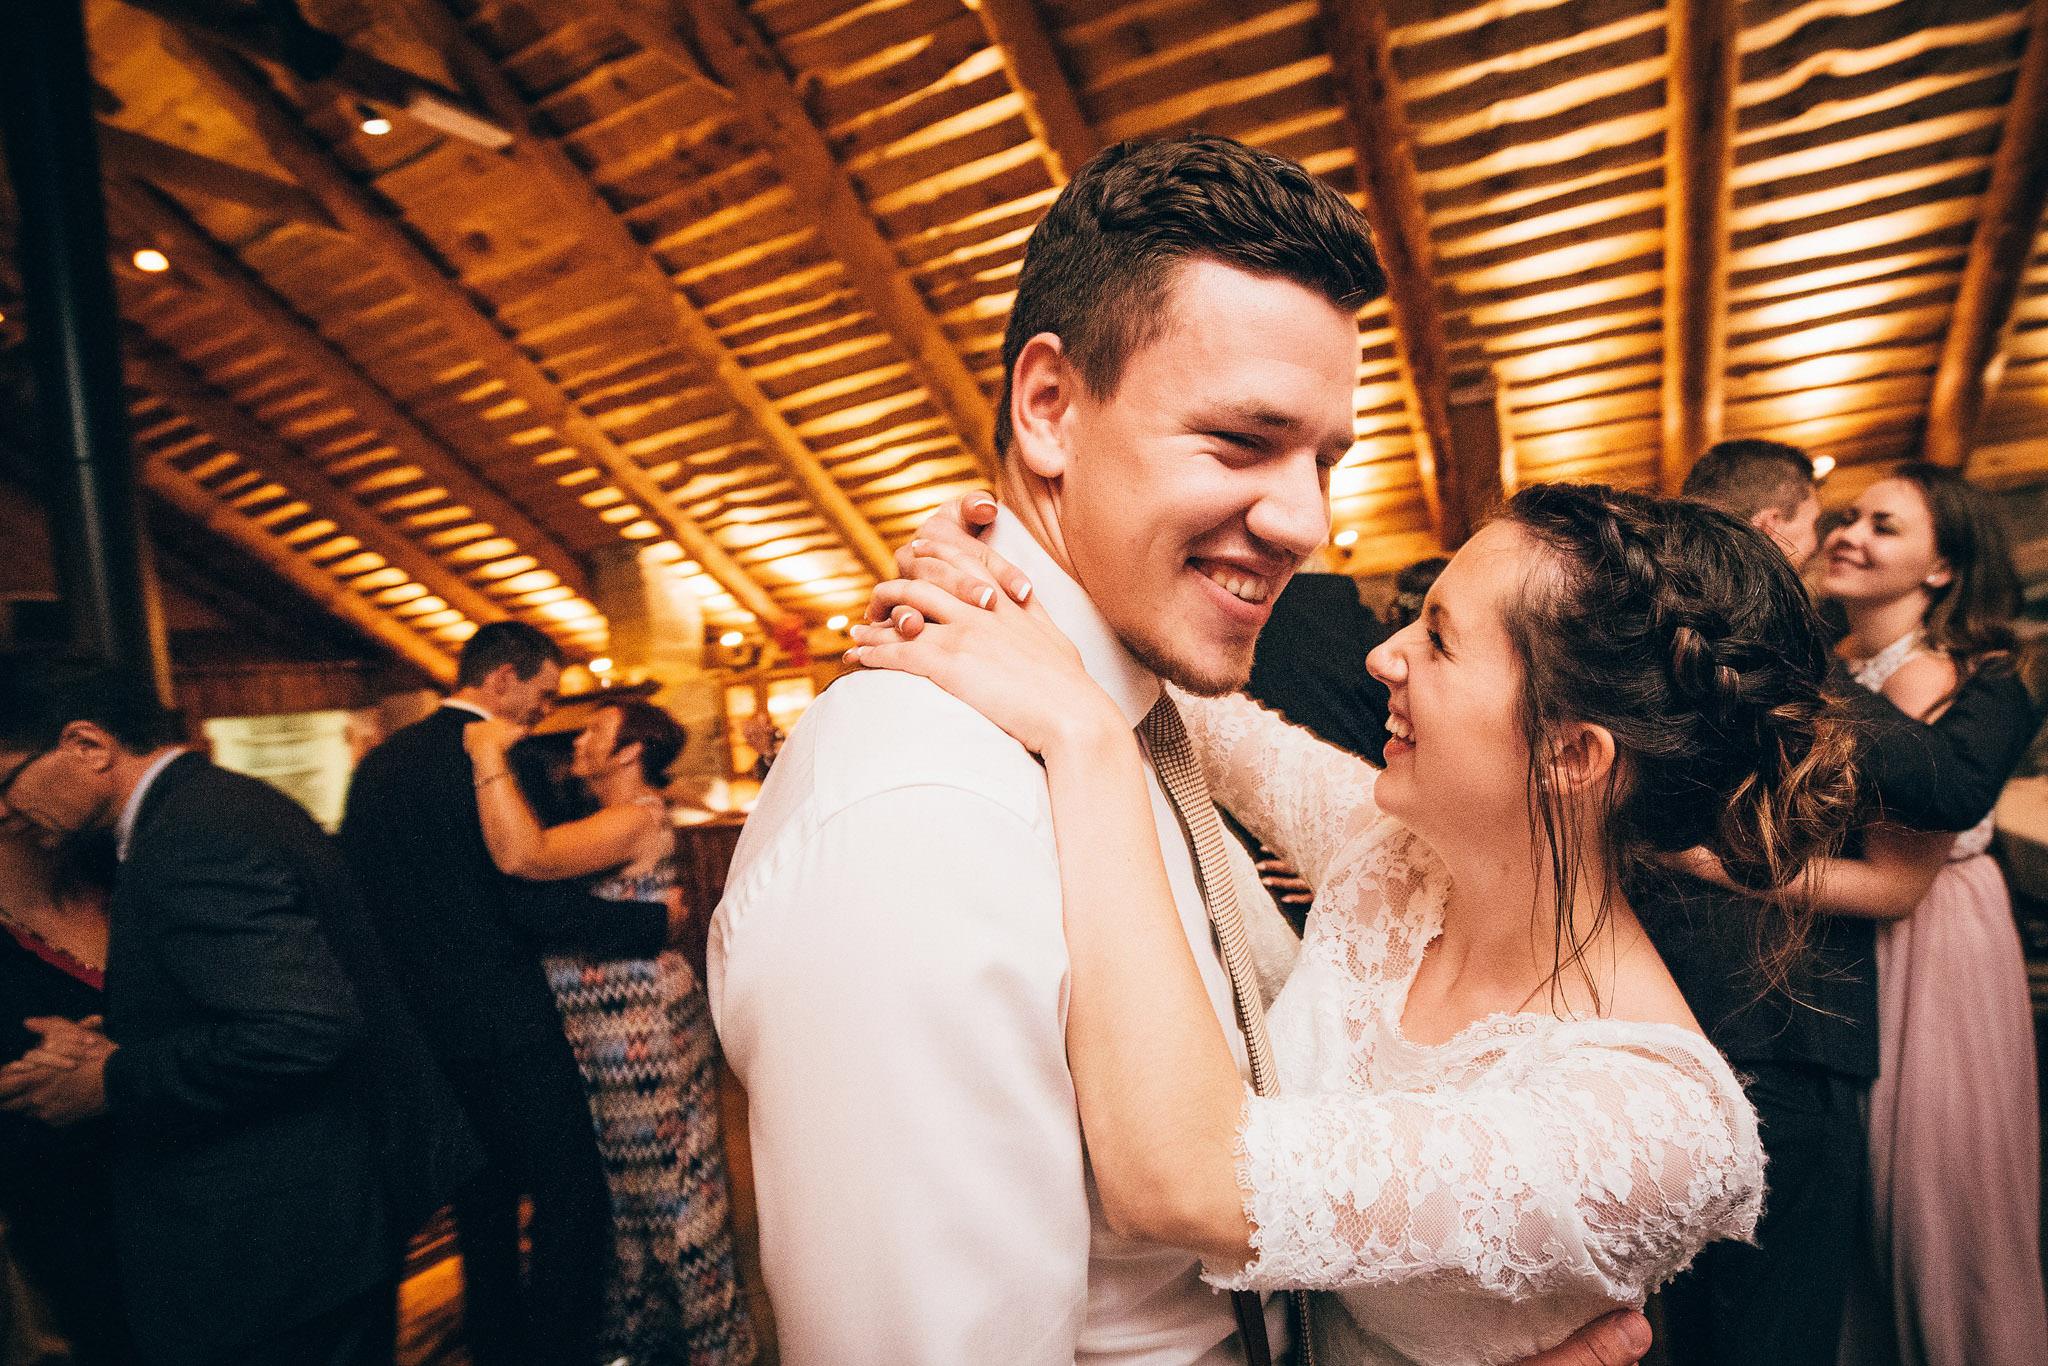 Norway+wedding+photographer+elopement+pre+wedding+Casey+Arneson-129.jpg